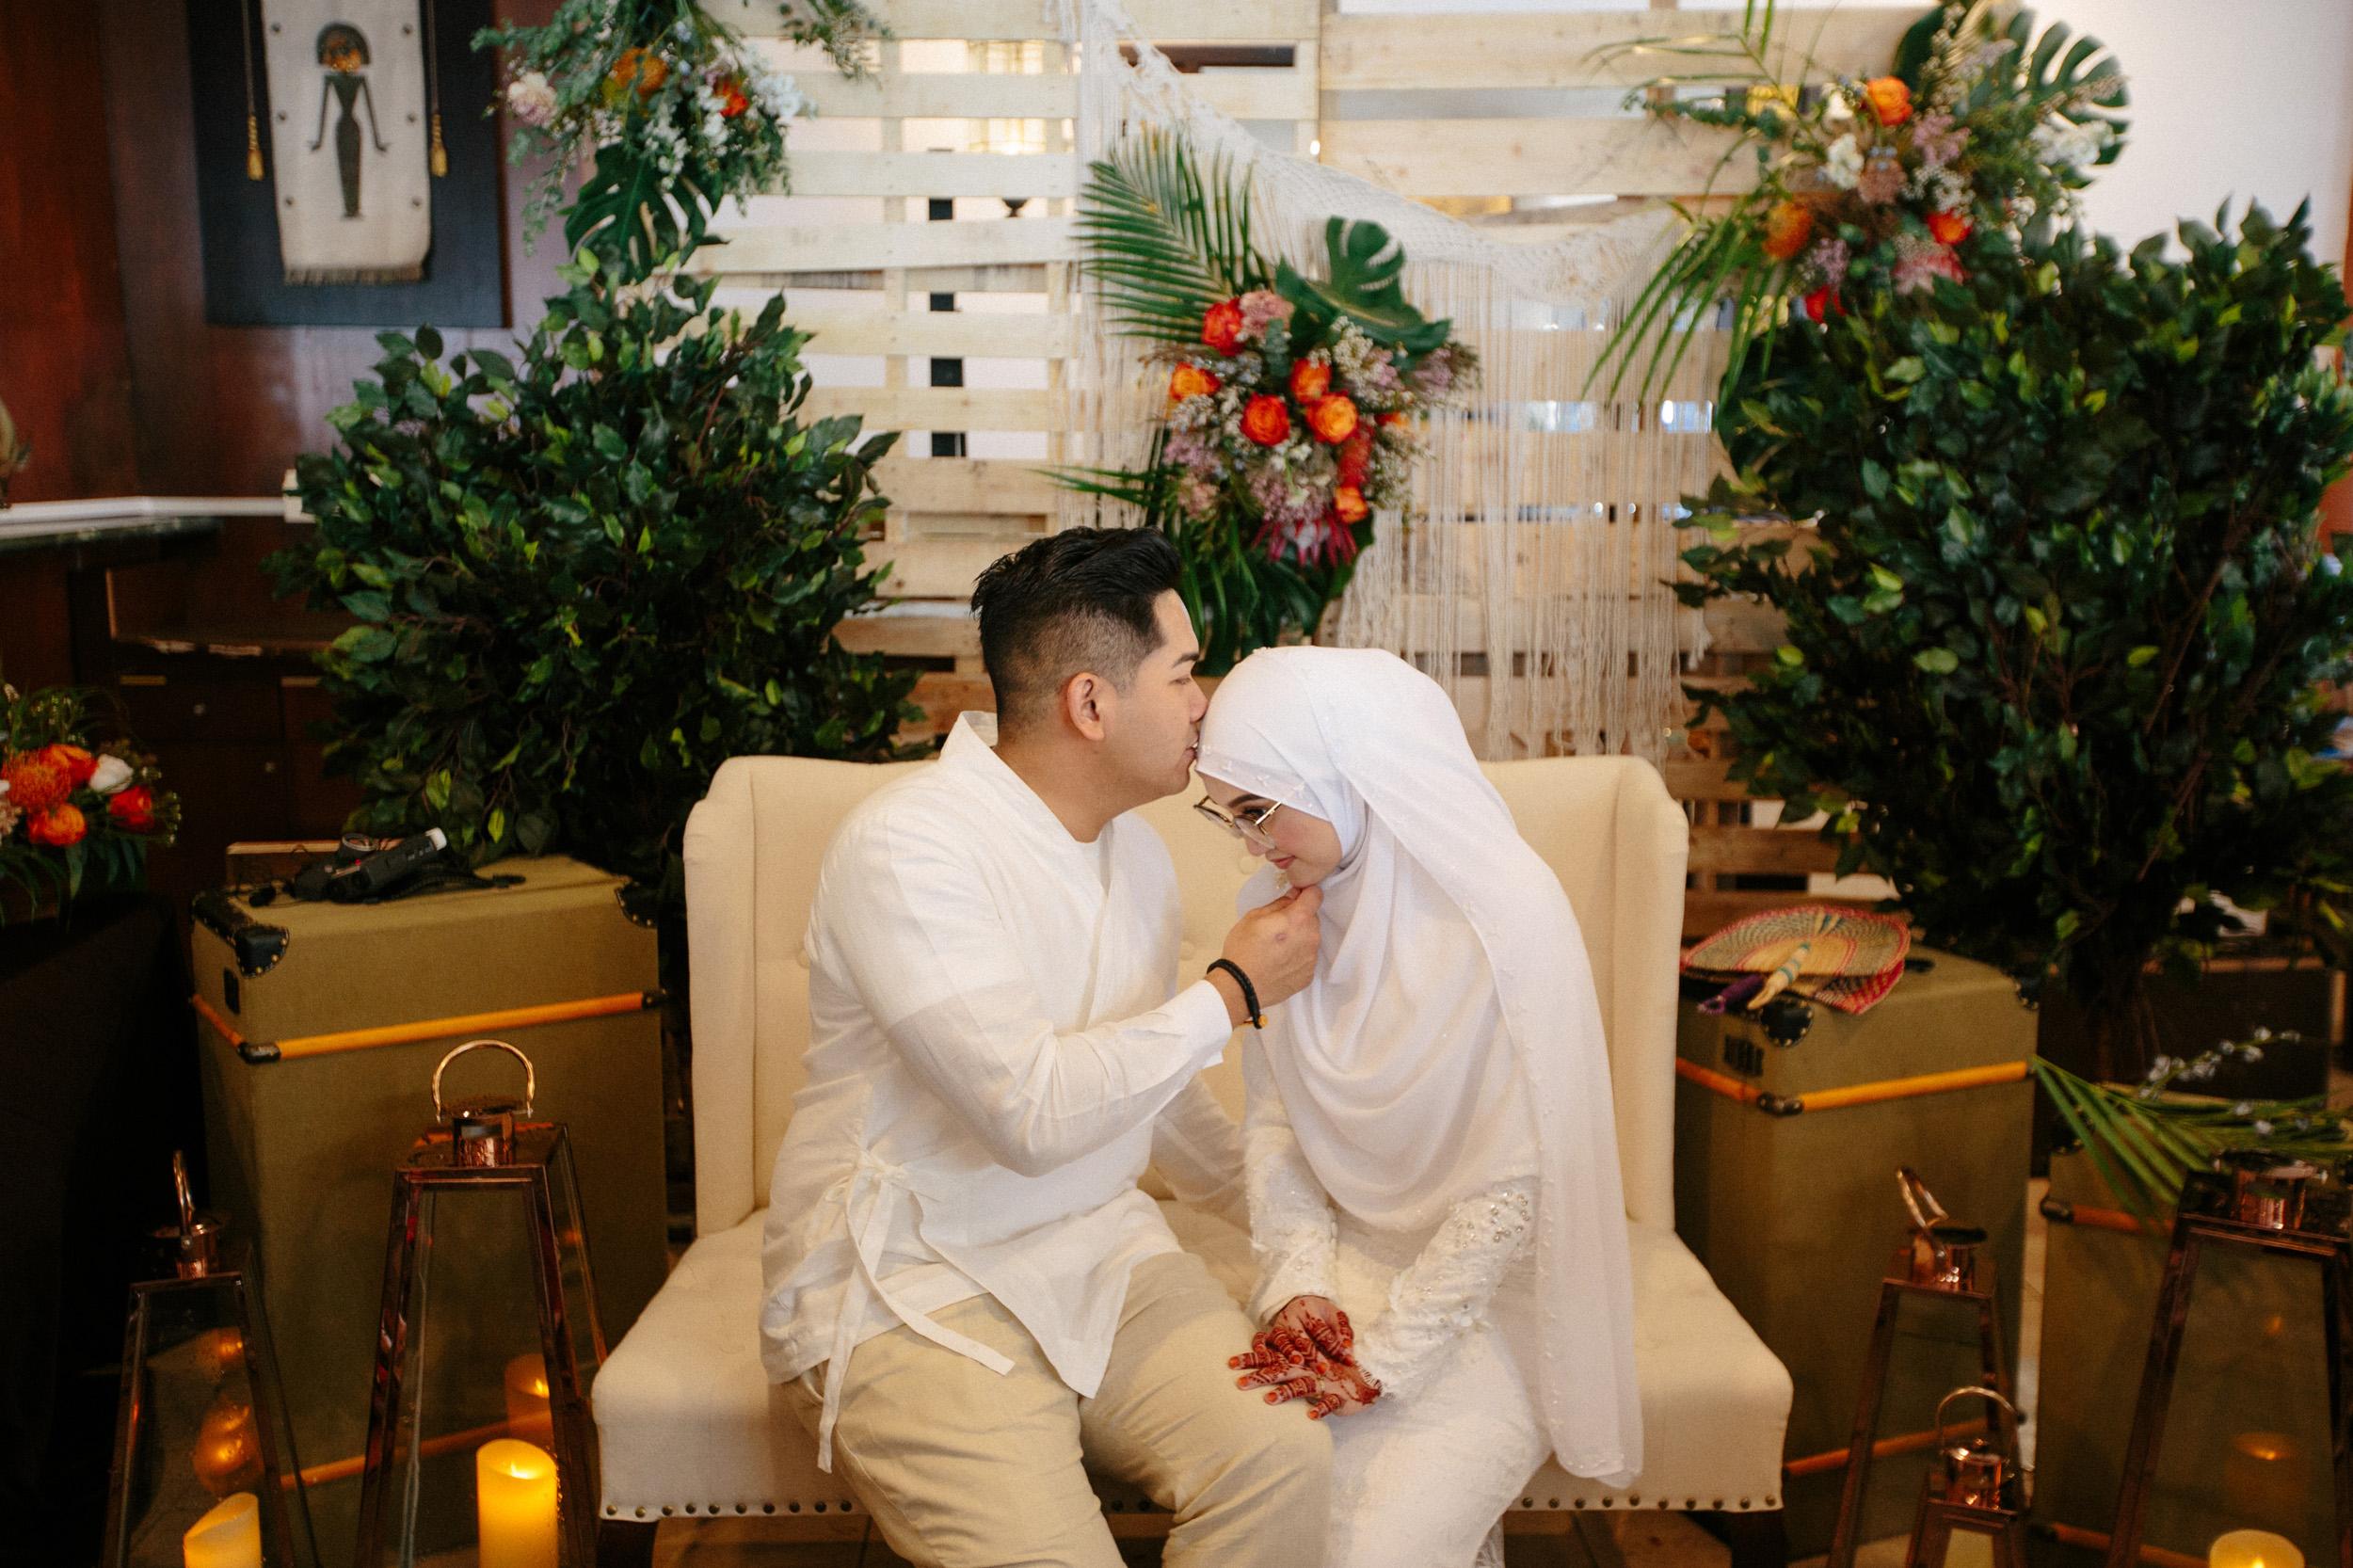 singapore-wedding-photographer-photography-wmt2017-146.jpg